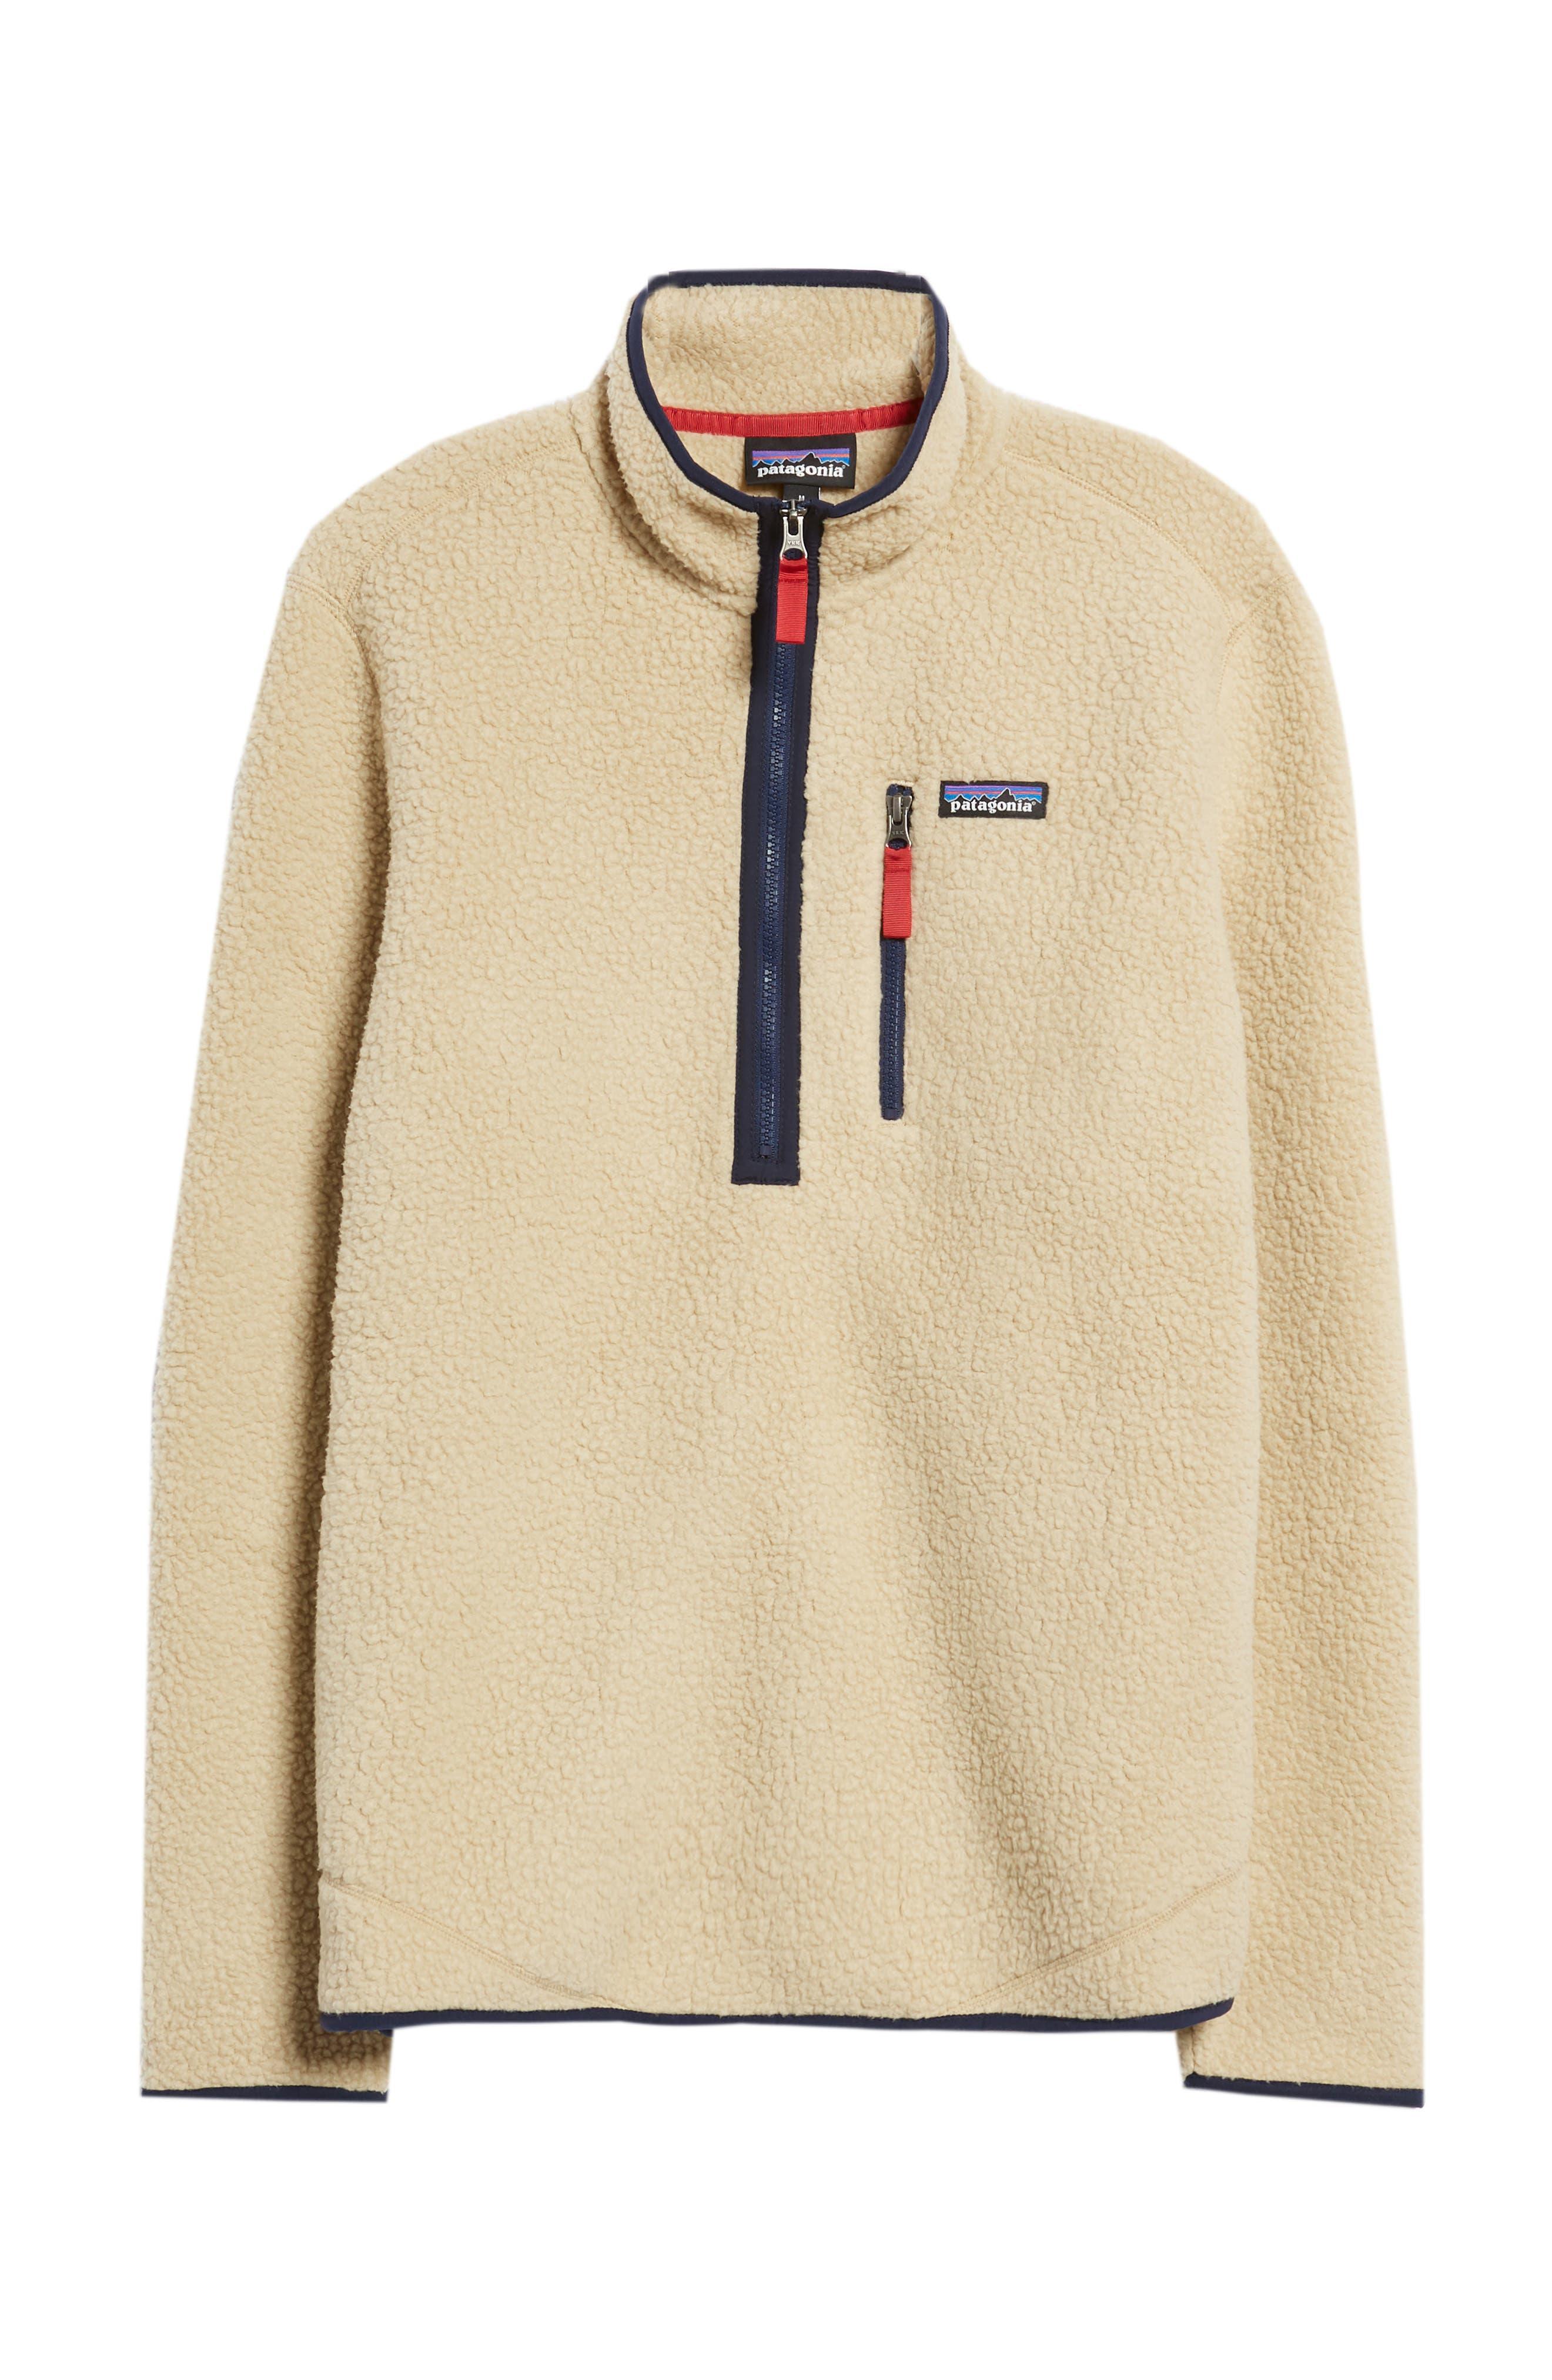 Retro Pile Fleece Zip Jacket,                             Alternate thumbnail 6, color,                             EL CAP KHAKI